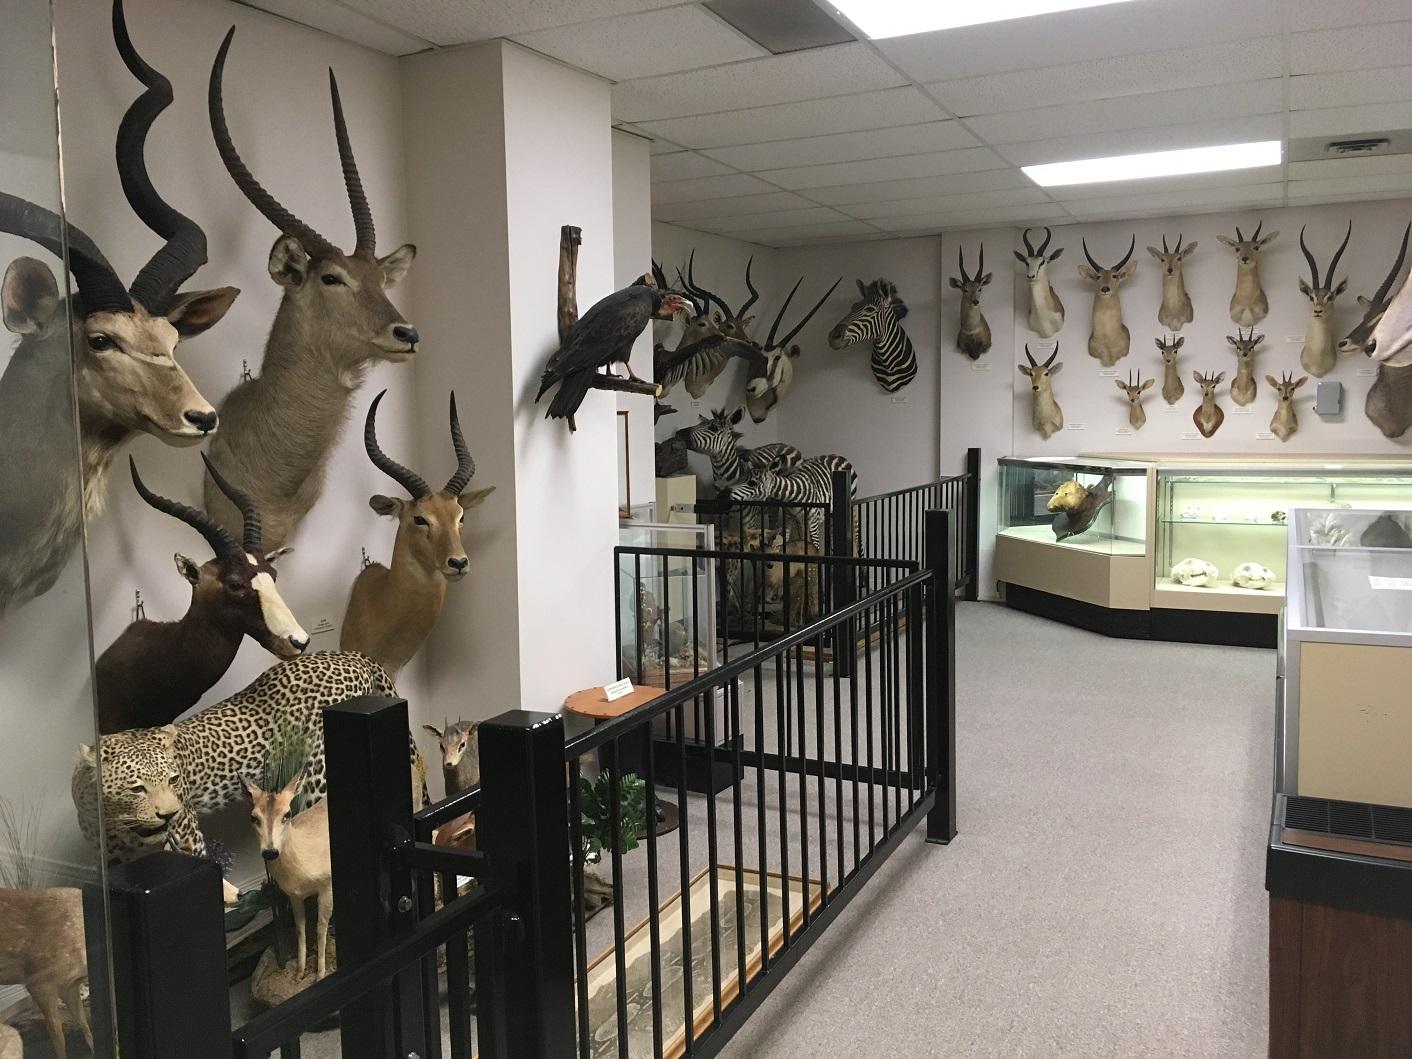 stuffed animals, stones and bones museum